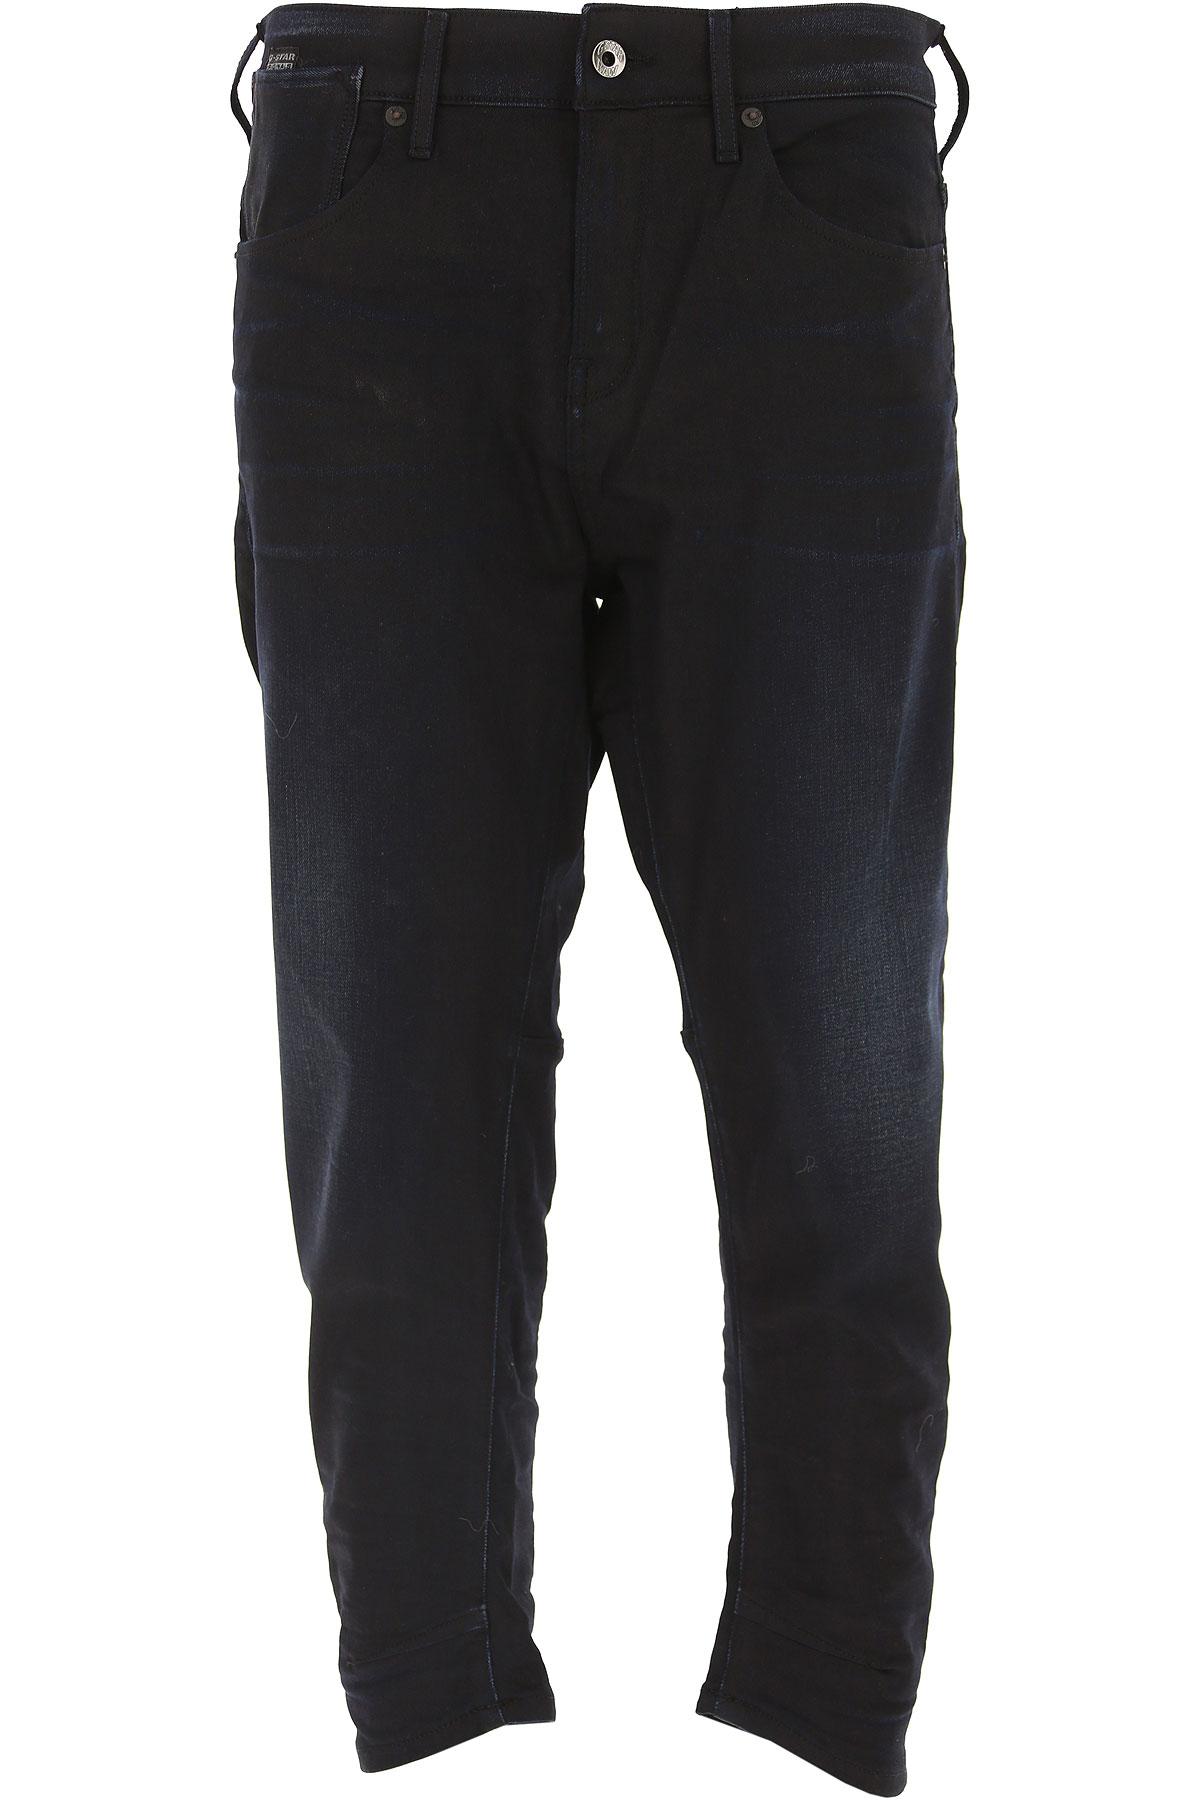 Image of G-Star Jeans On Sale in Outlet, Dark Blue Denim, lyocell, 2017, 27 28 29 30